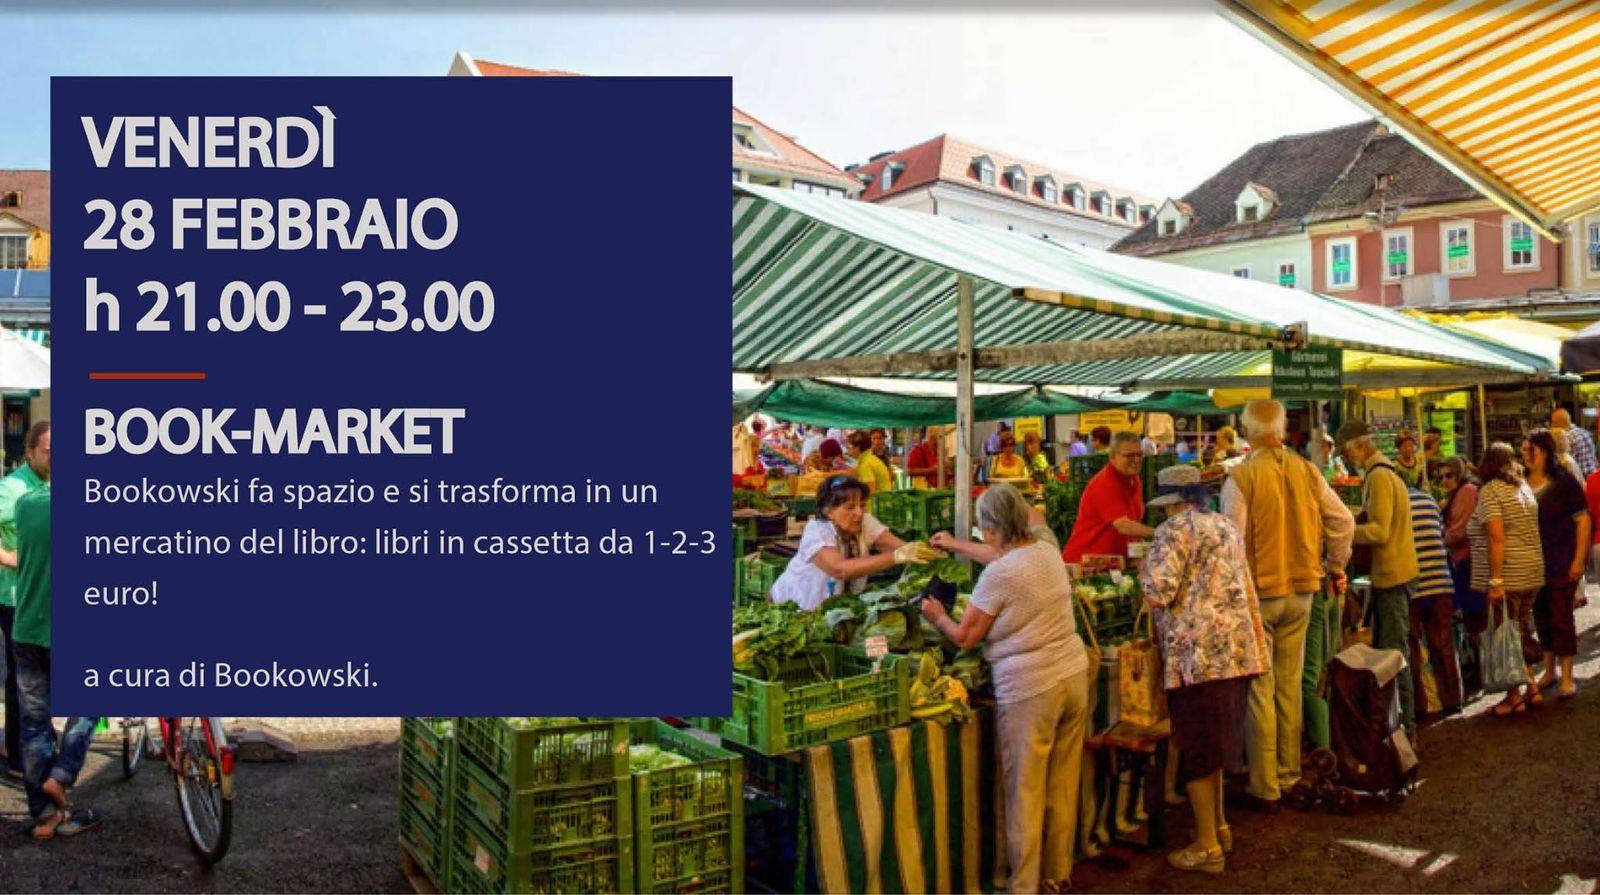 Book-market!